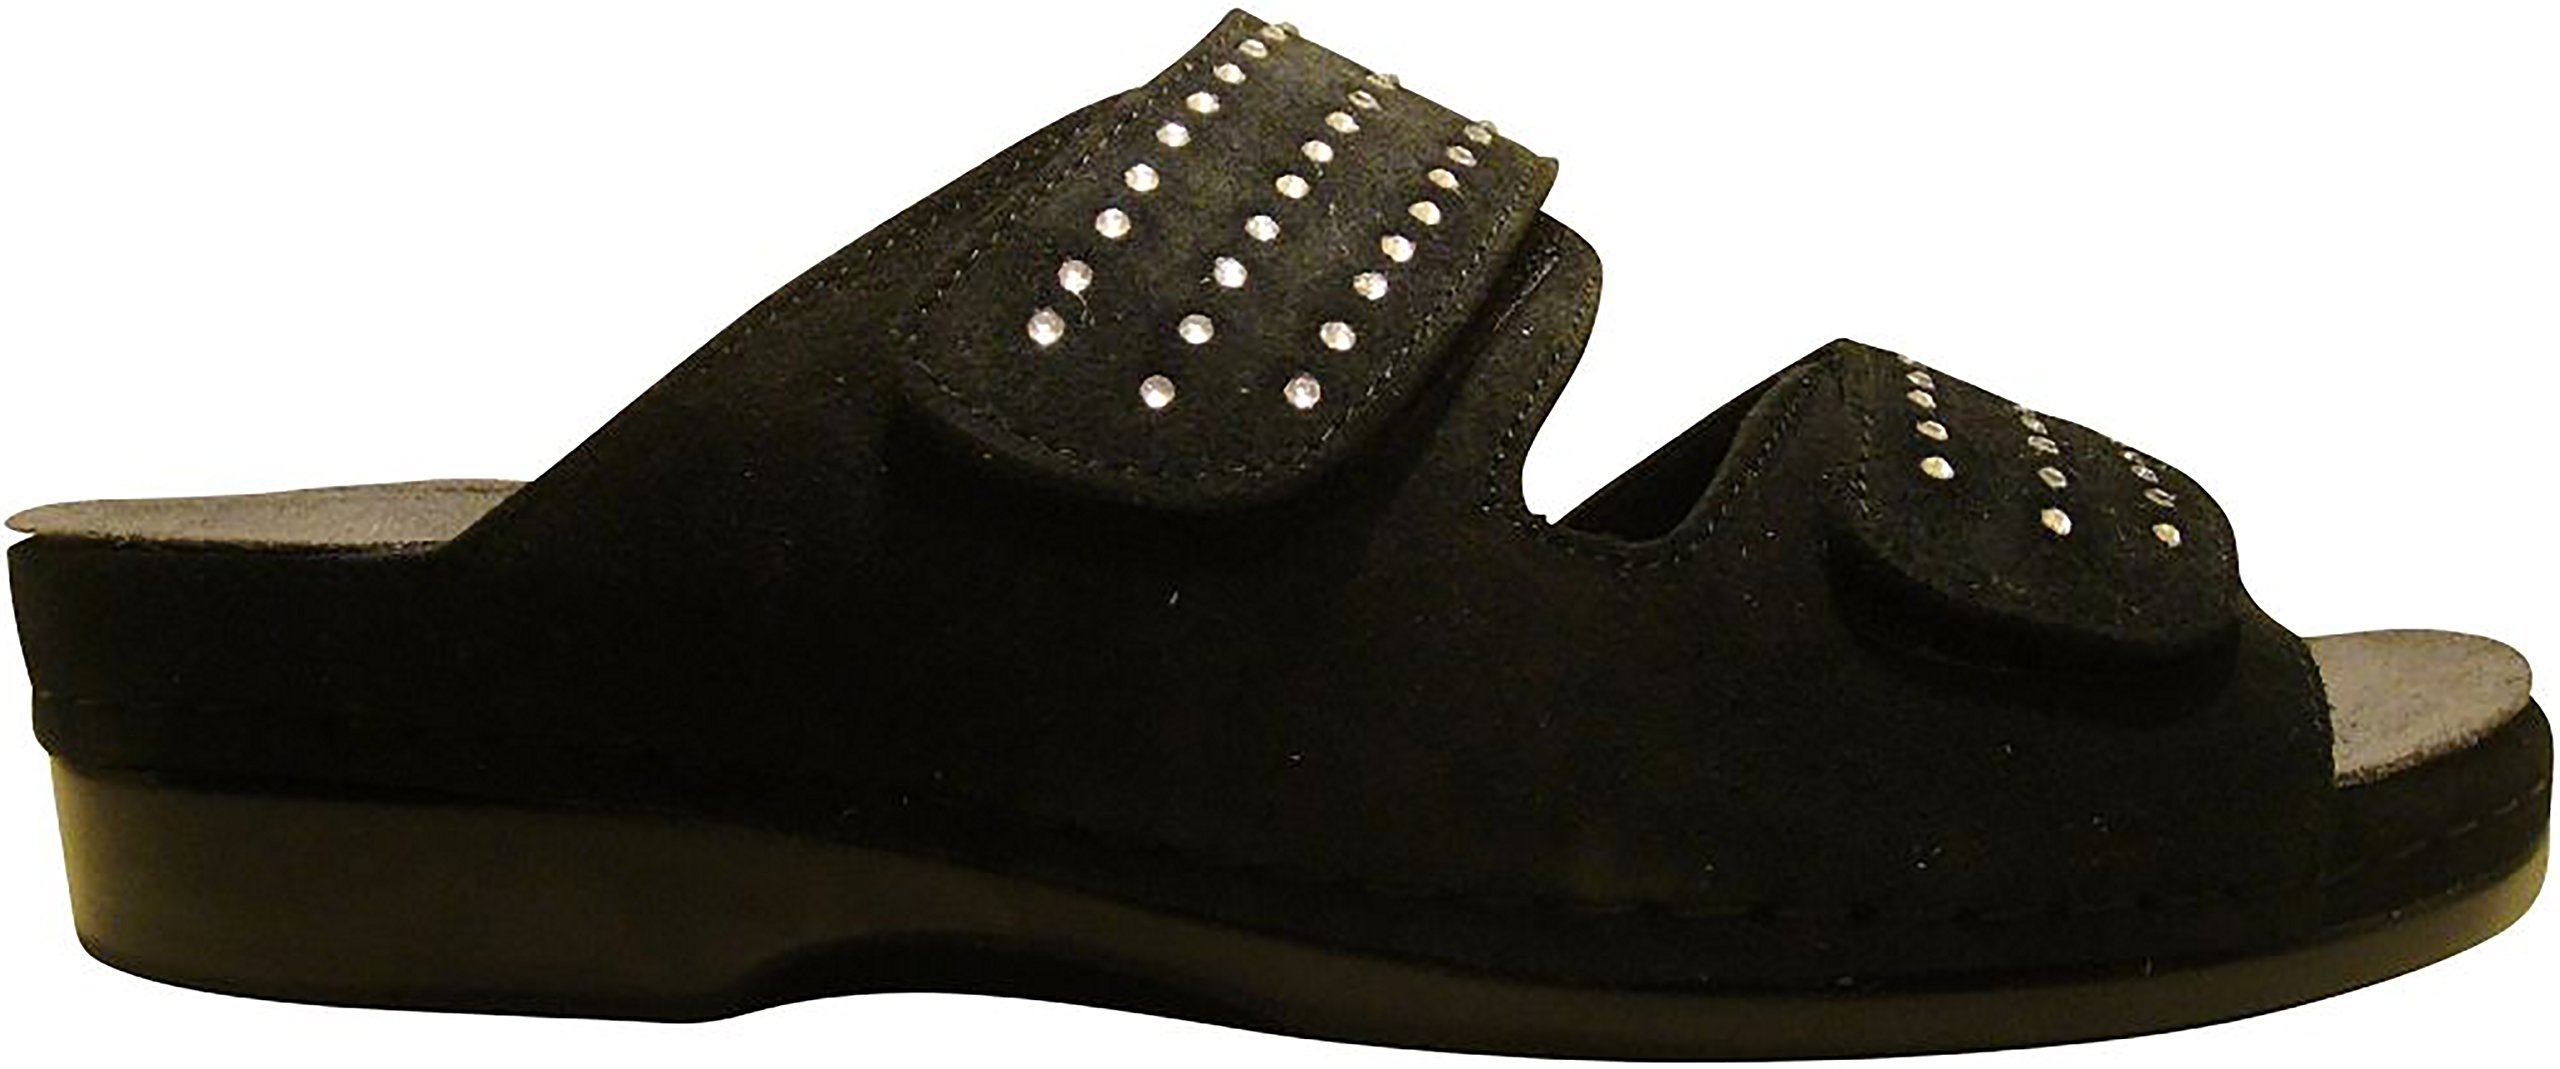 Helle Comfort Helle Fashion Comfort Women's TALASI Black 2 Velcro Slide Size 38